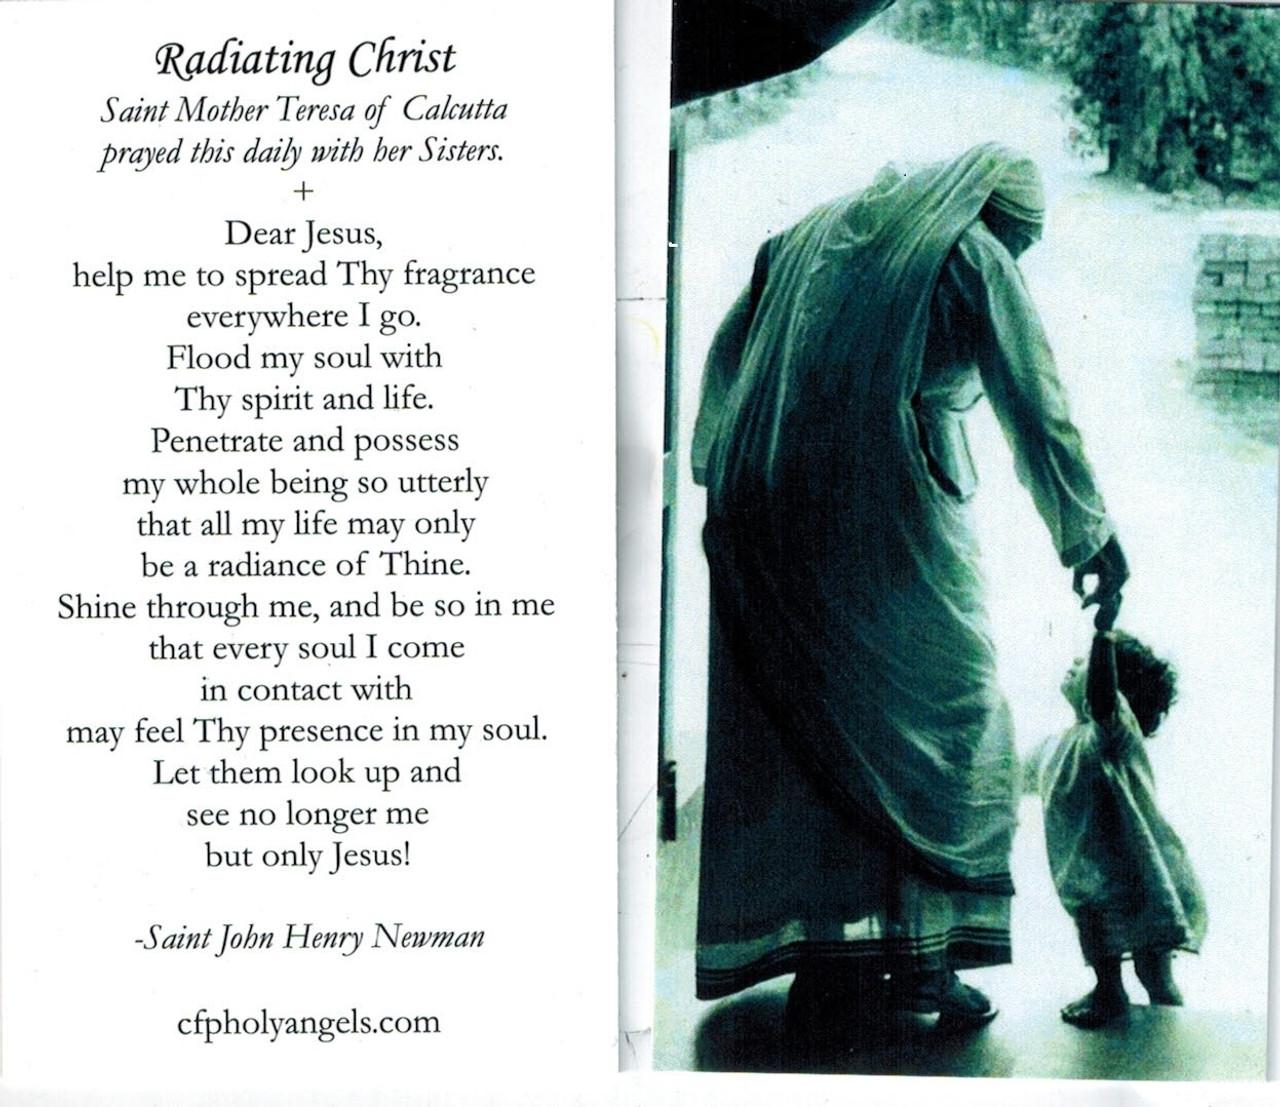 Radiating Christ Prayer Card